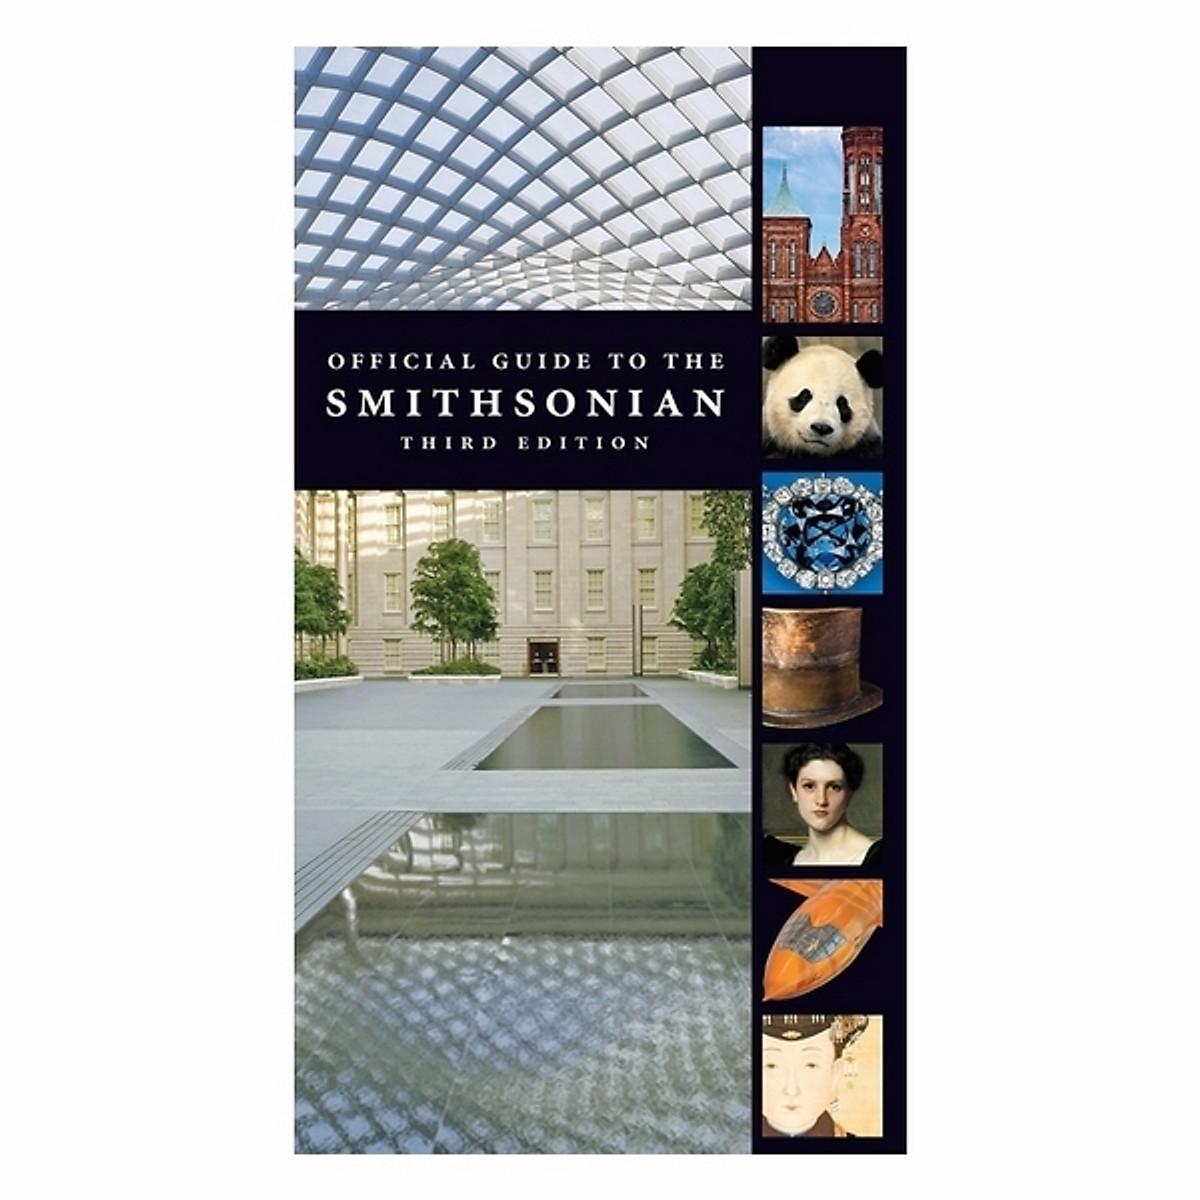 Hình đại diện sản phẩm Official Guide To The Smithsonian, 3rd Edition: Third Edition